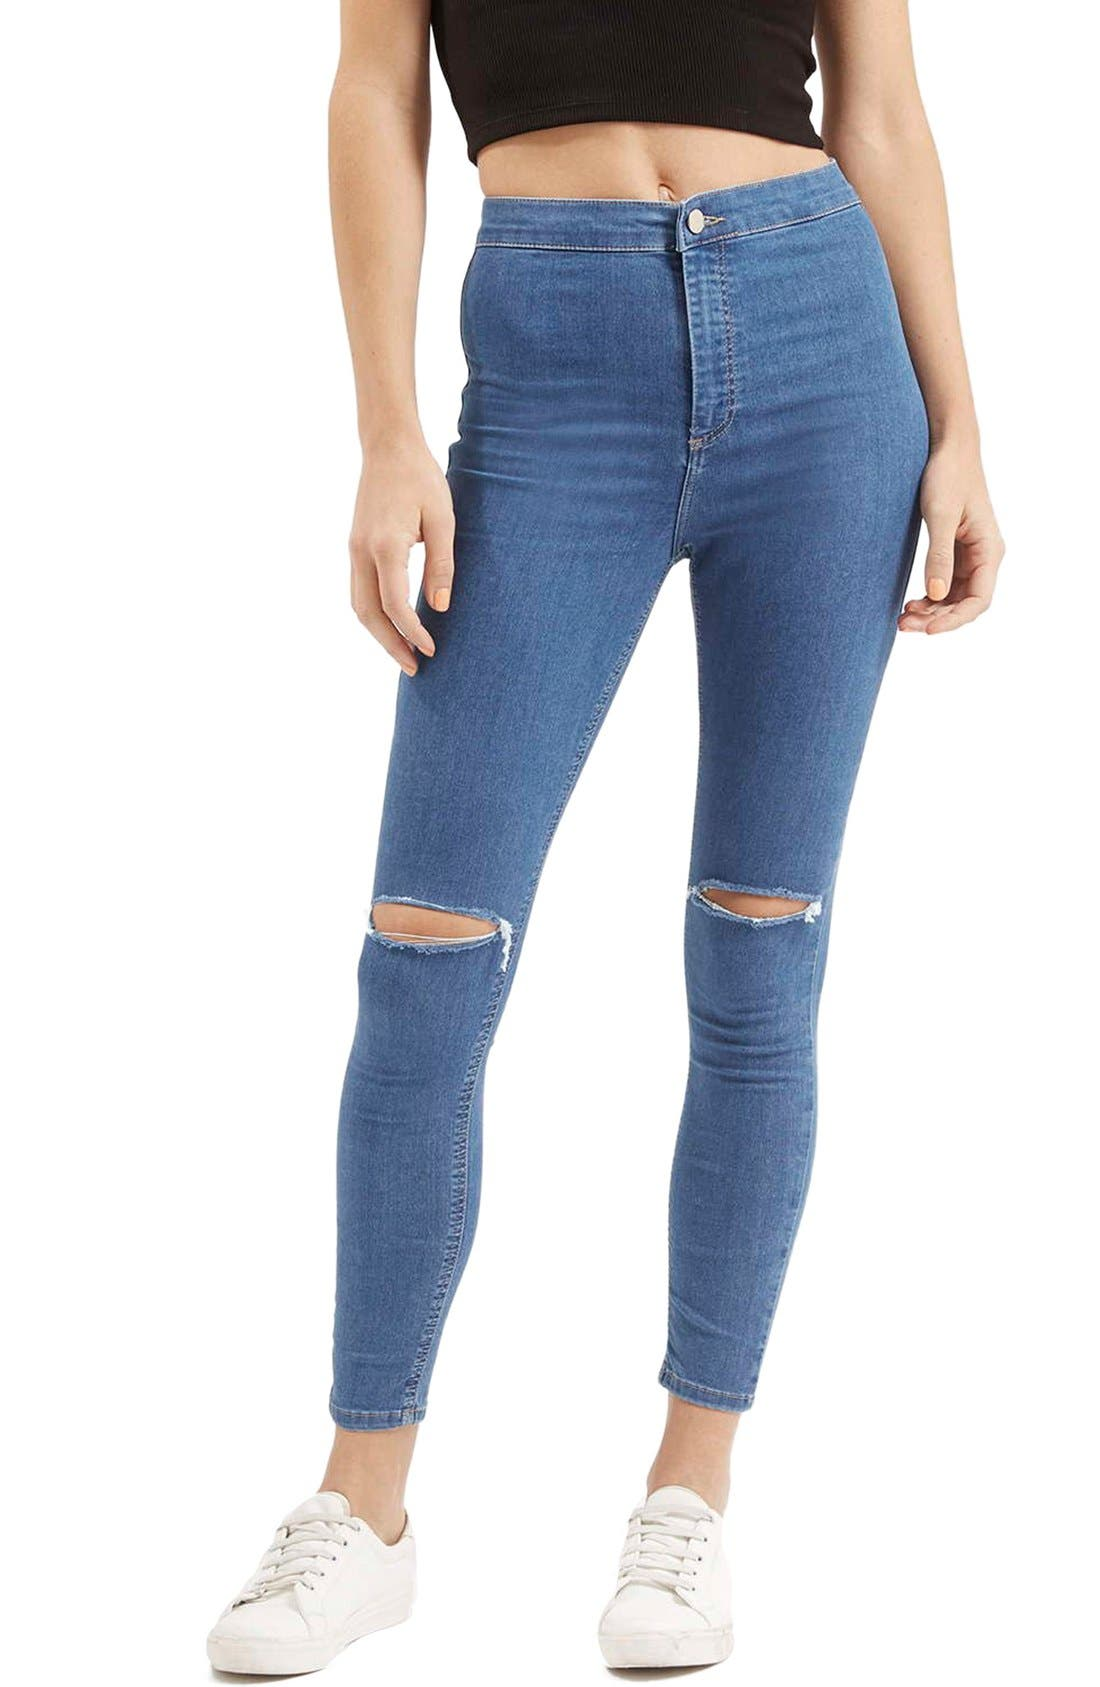 Main Image - Topshop 'Joni' RippedHigh Rise Skinny Jeans (Petite)